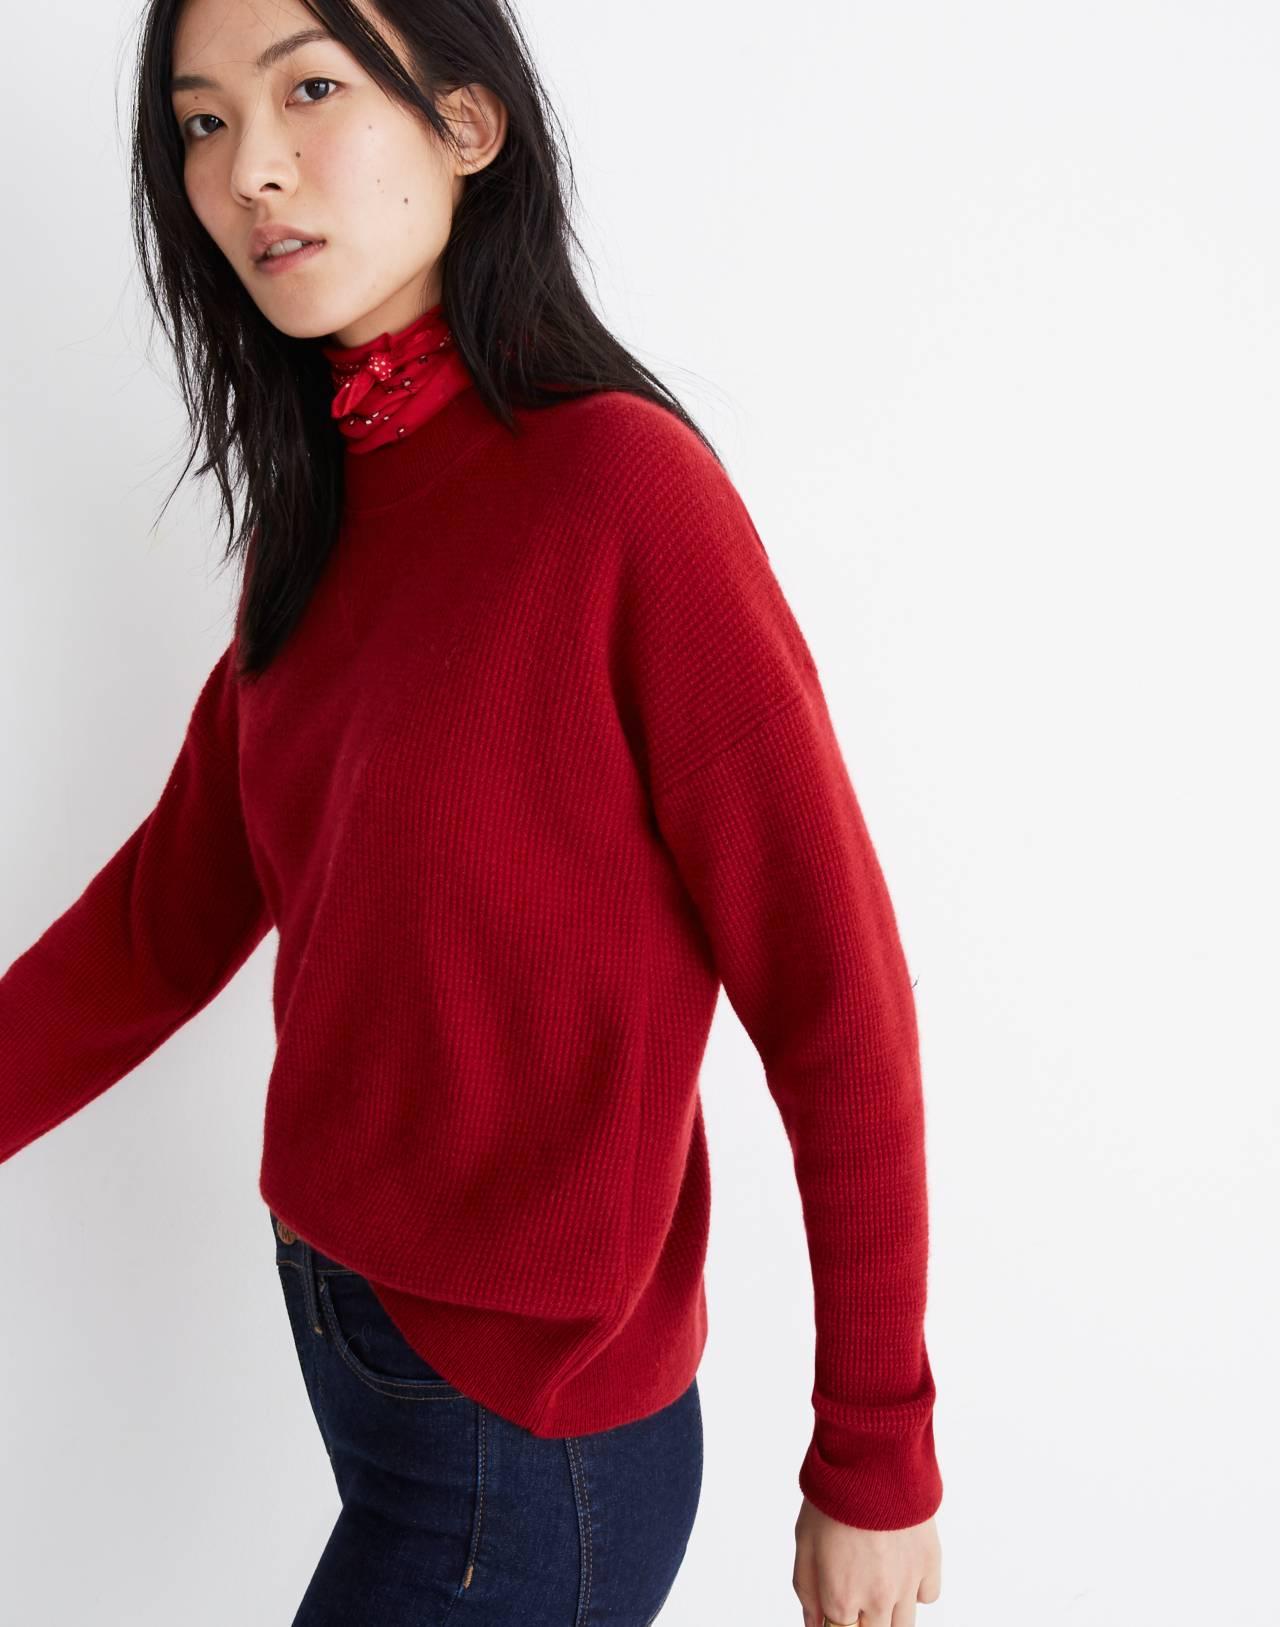 Cashmere Sweatshirt in crimson red image 2